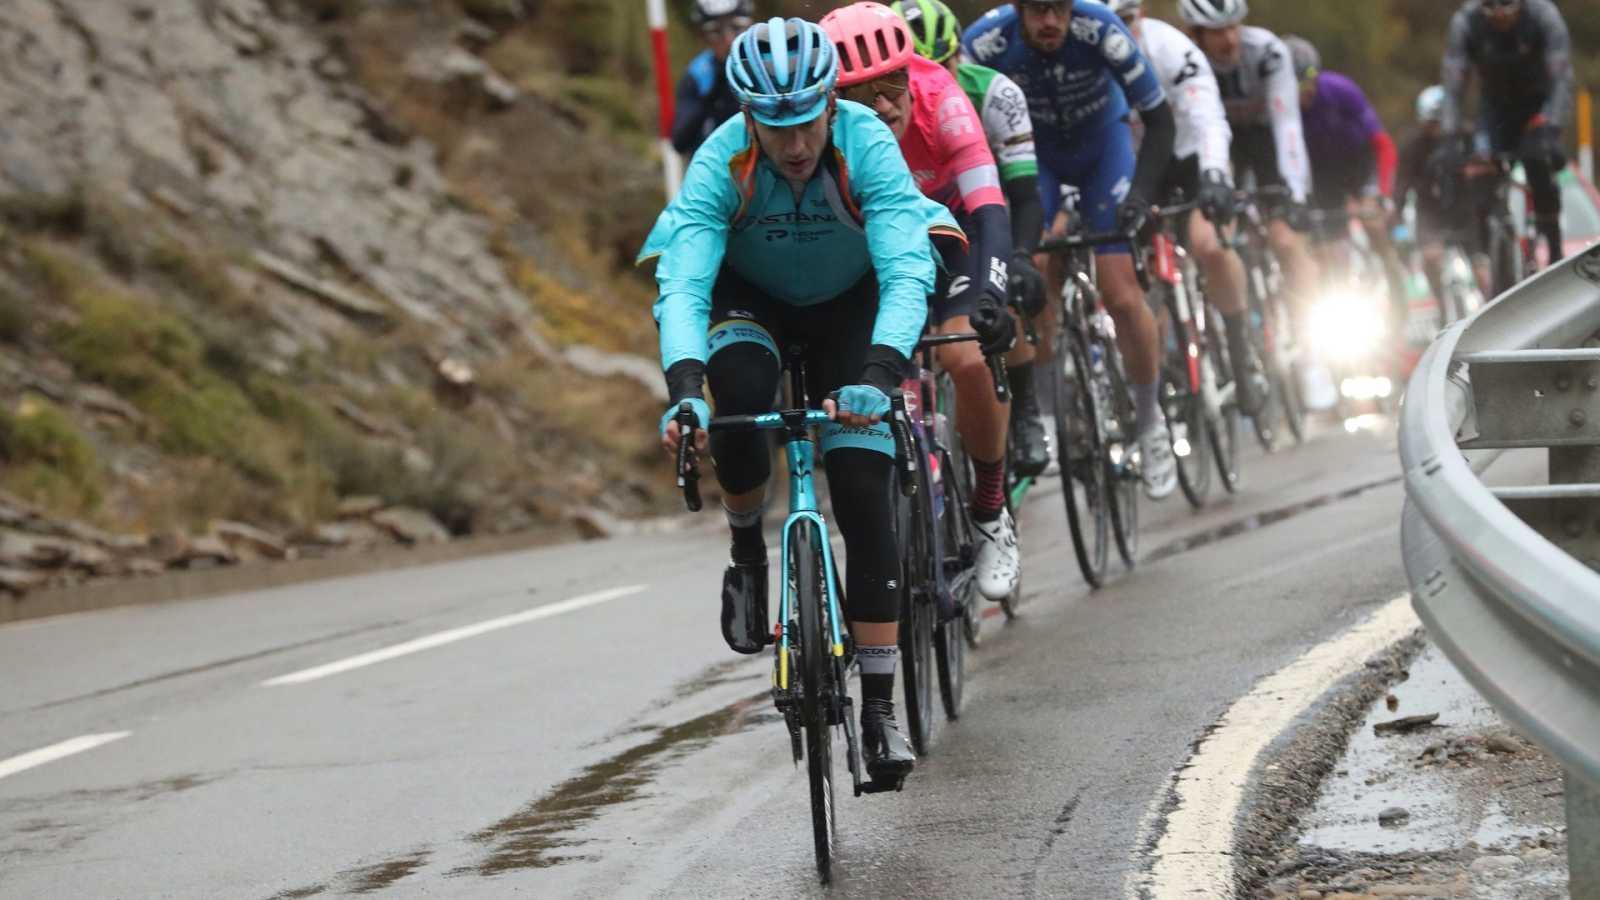 Vuelta ciclista a España 2020 - 6ª etapa: Biescas - Sallent de Gállego-Aramón Formigal (2) - ver ahora